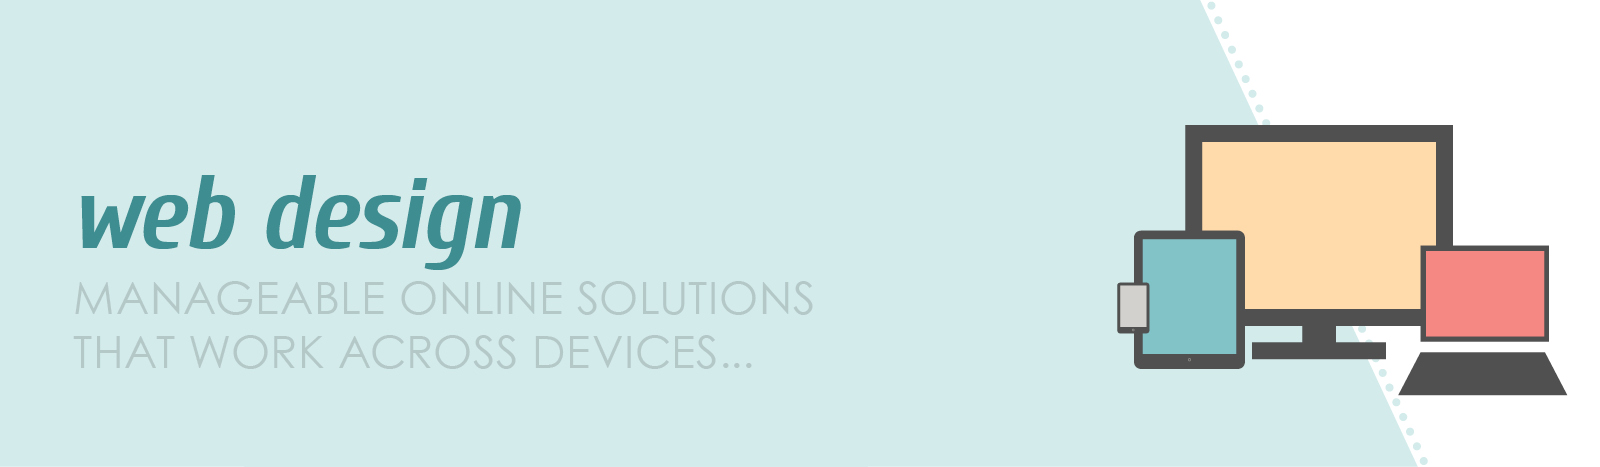 PageLines- ybcscroll3-webdesign.jpg